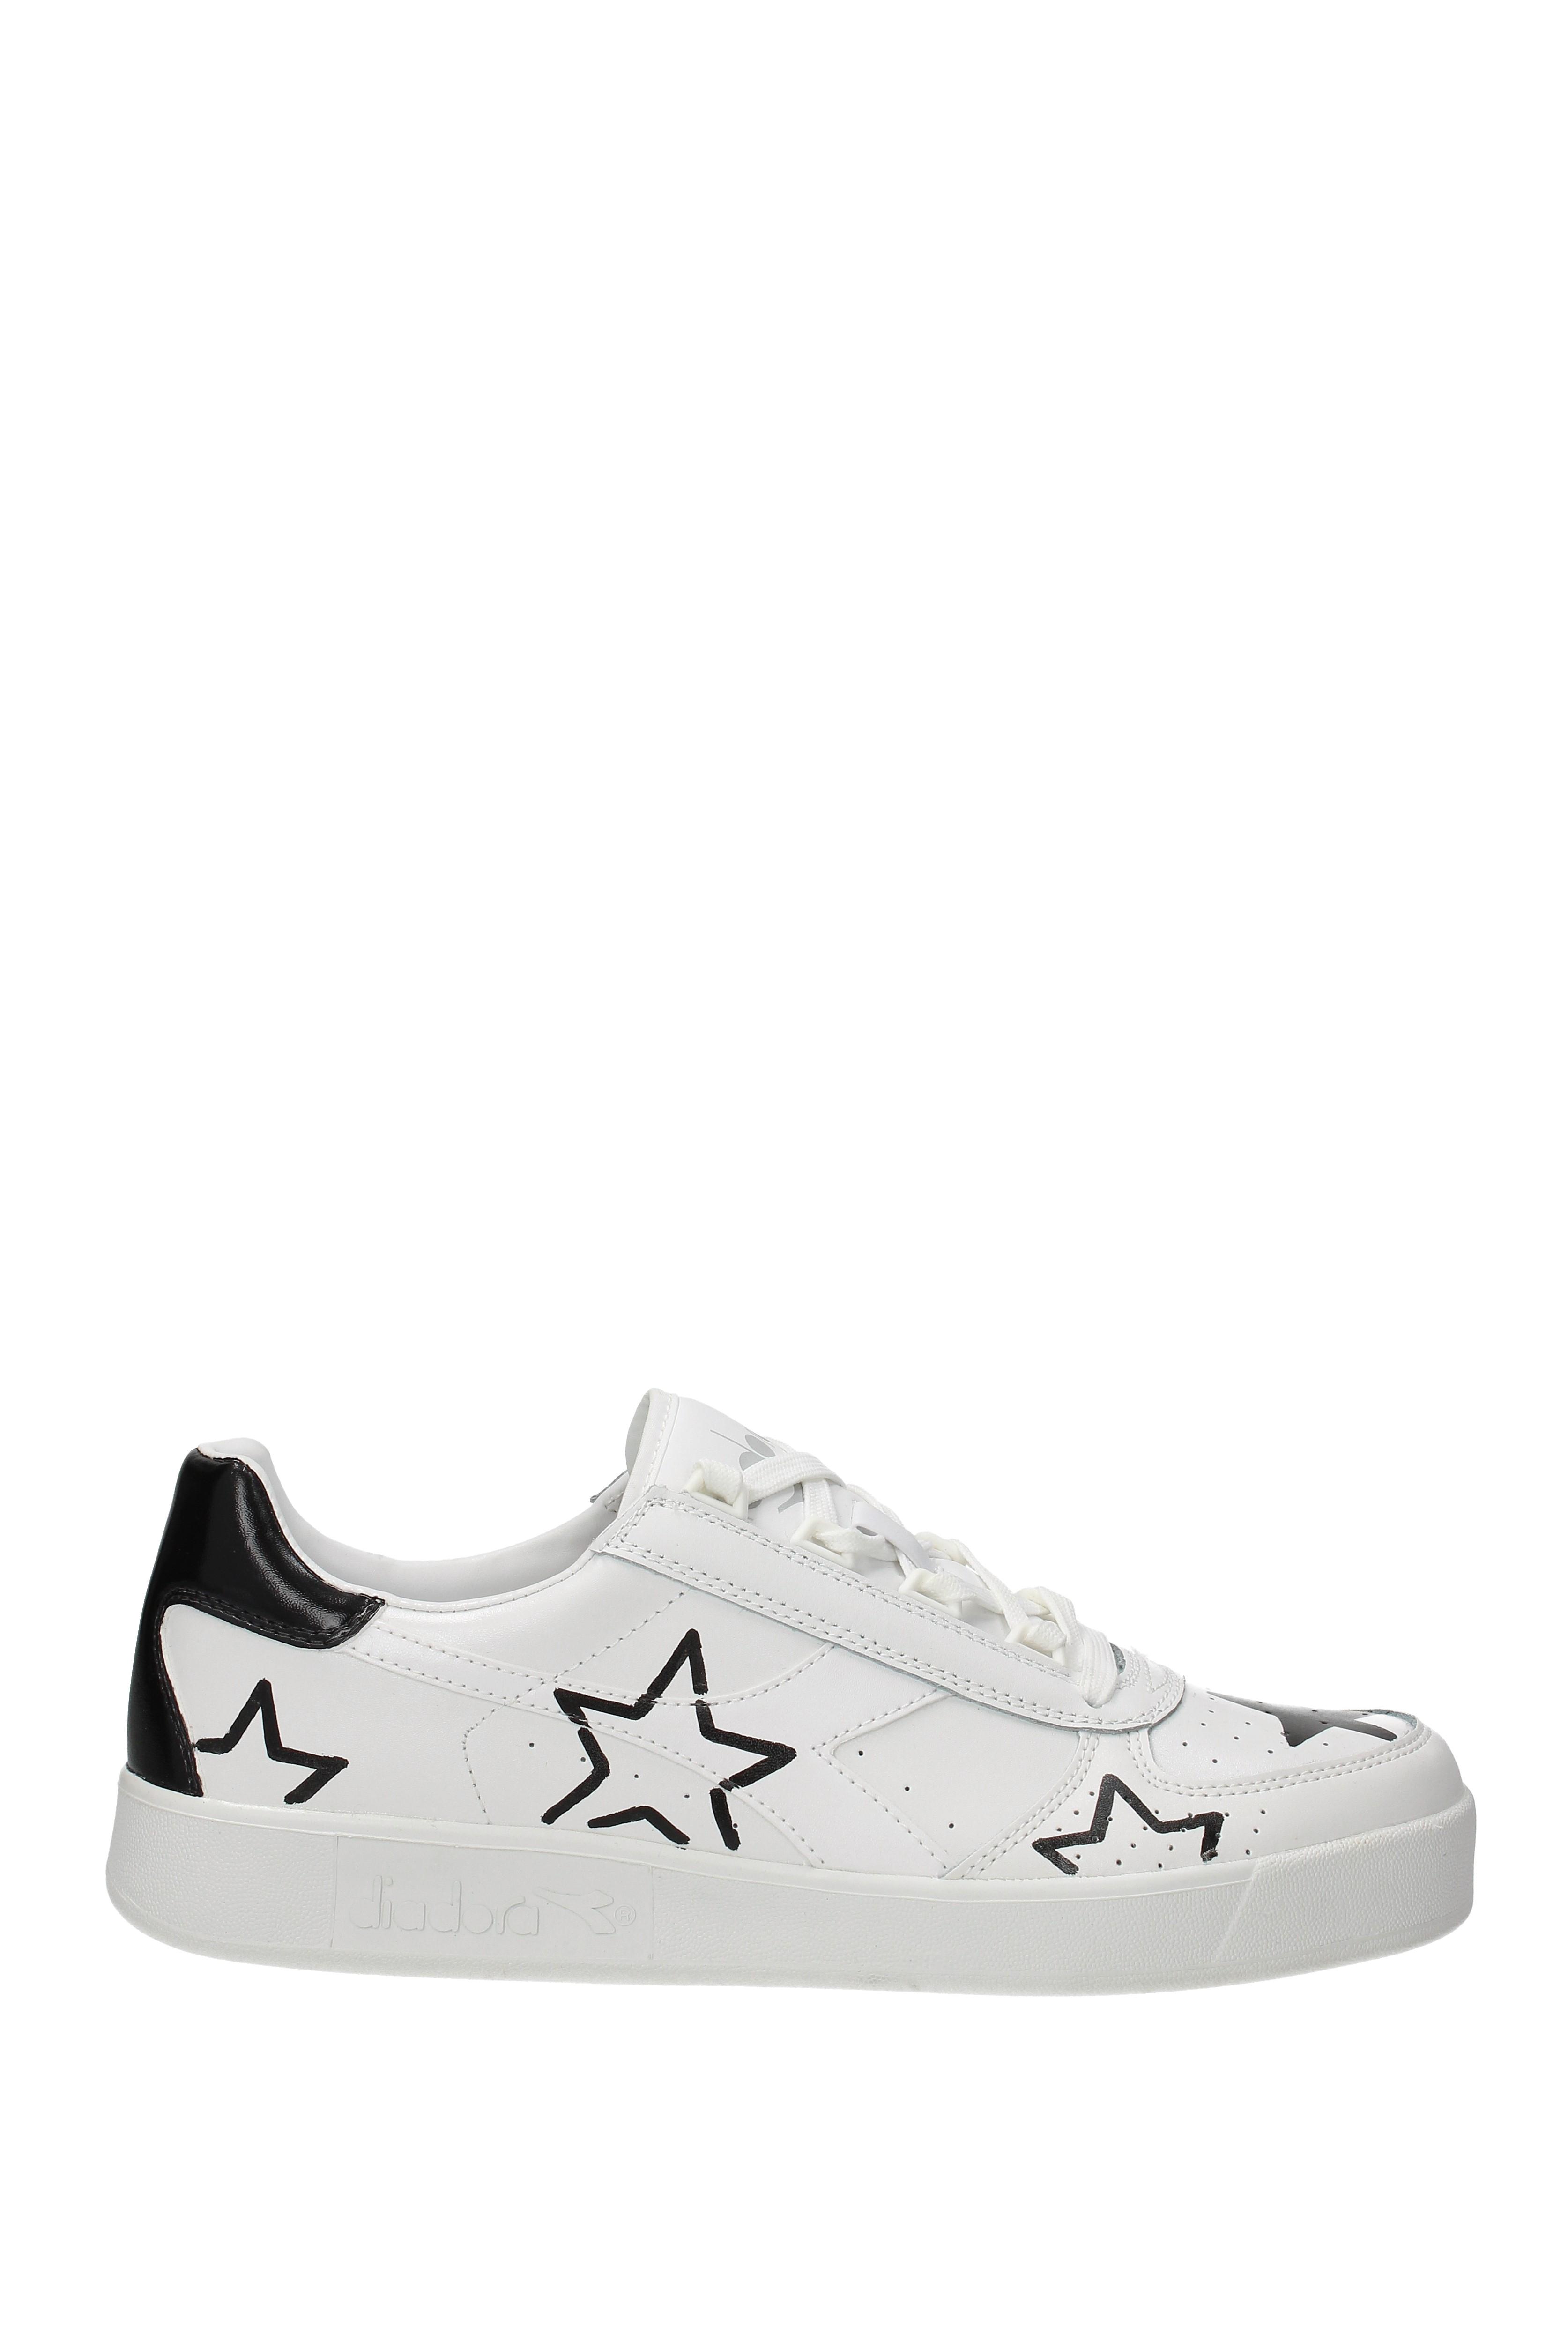 Sneakers Diadora the Heritage the Diadora editor b elite Damen - Leder (UOMO50117059501) 0c92c5